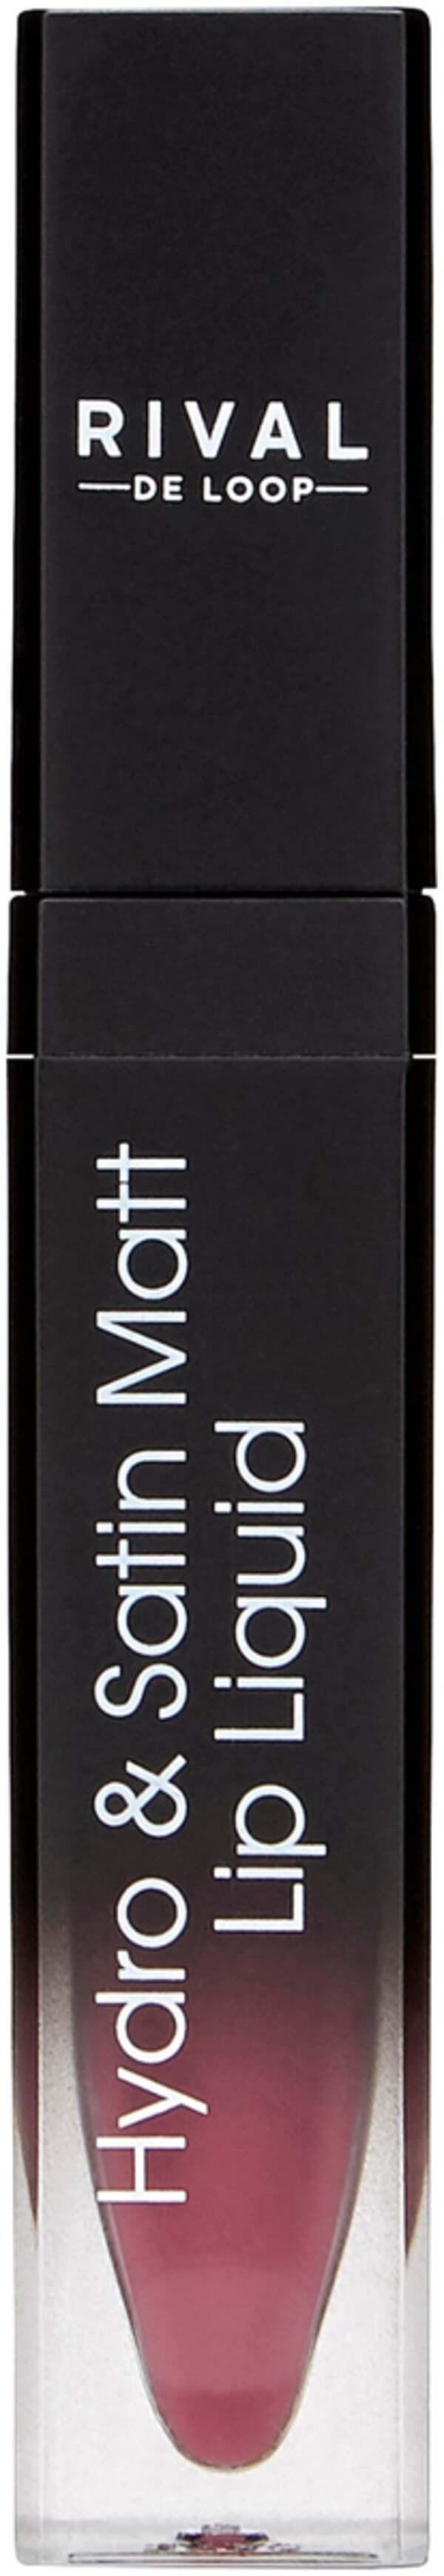 RIVAL DE LOOP Hydro & Satin Matt Lip Liquid 02